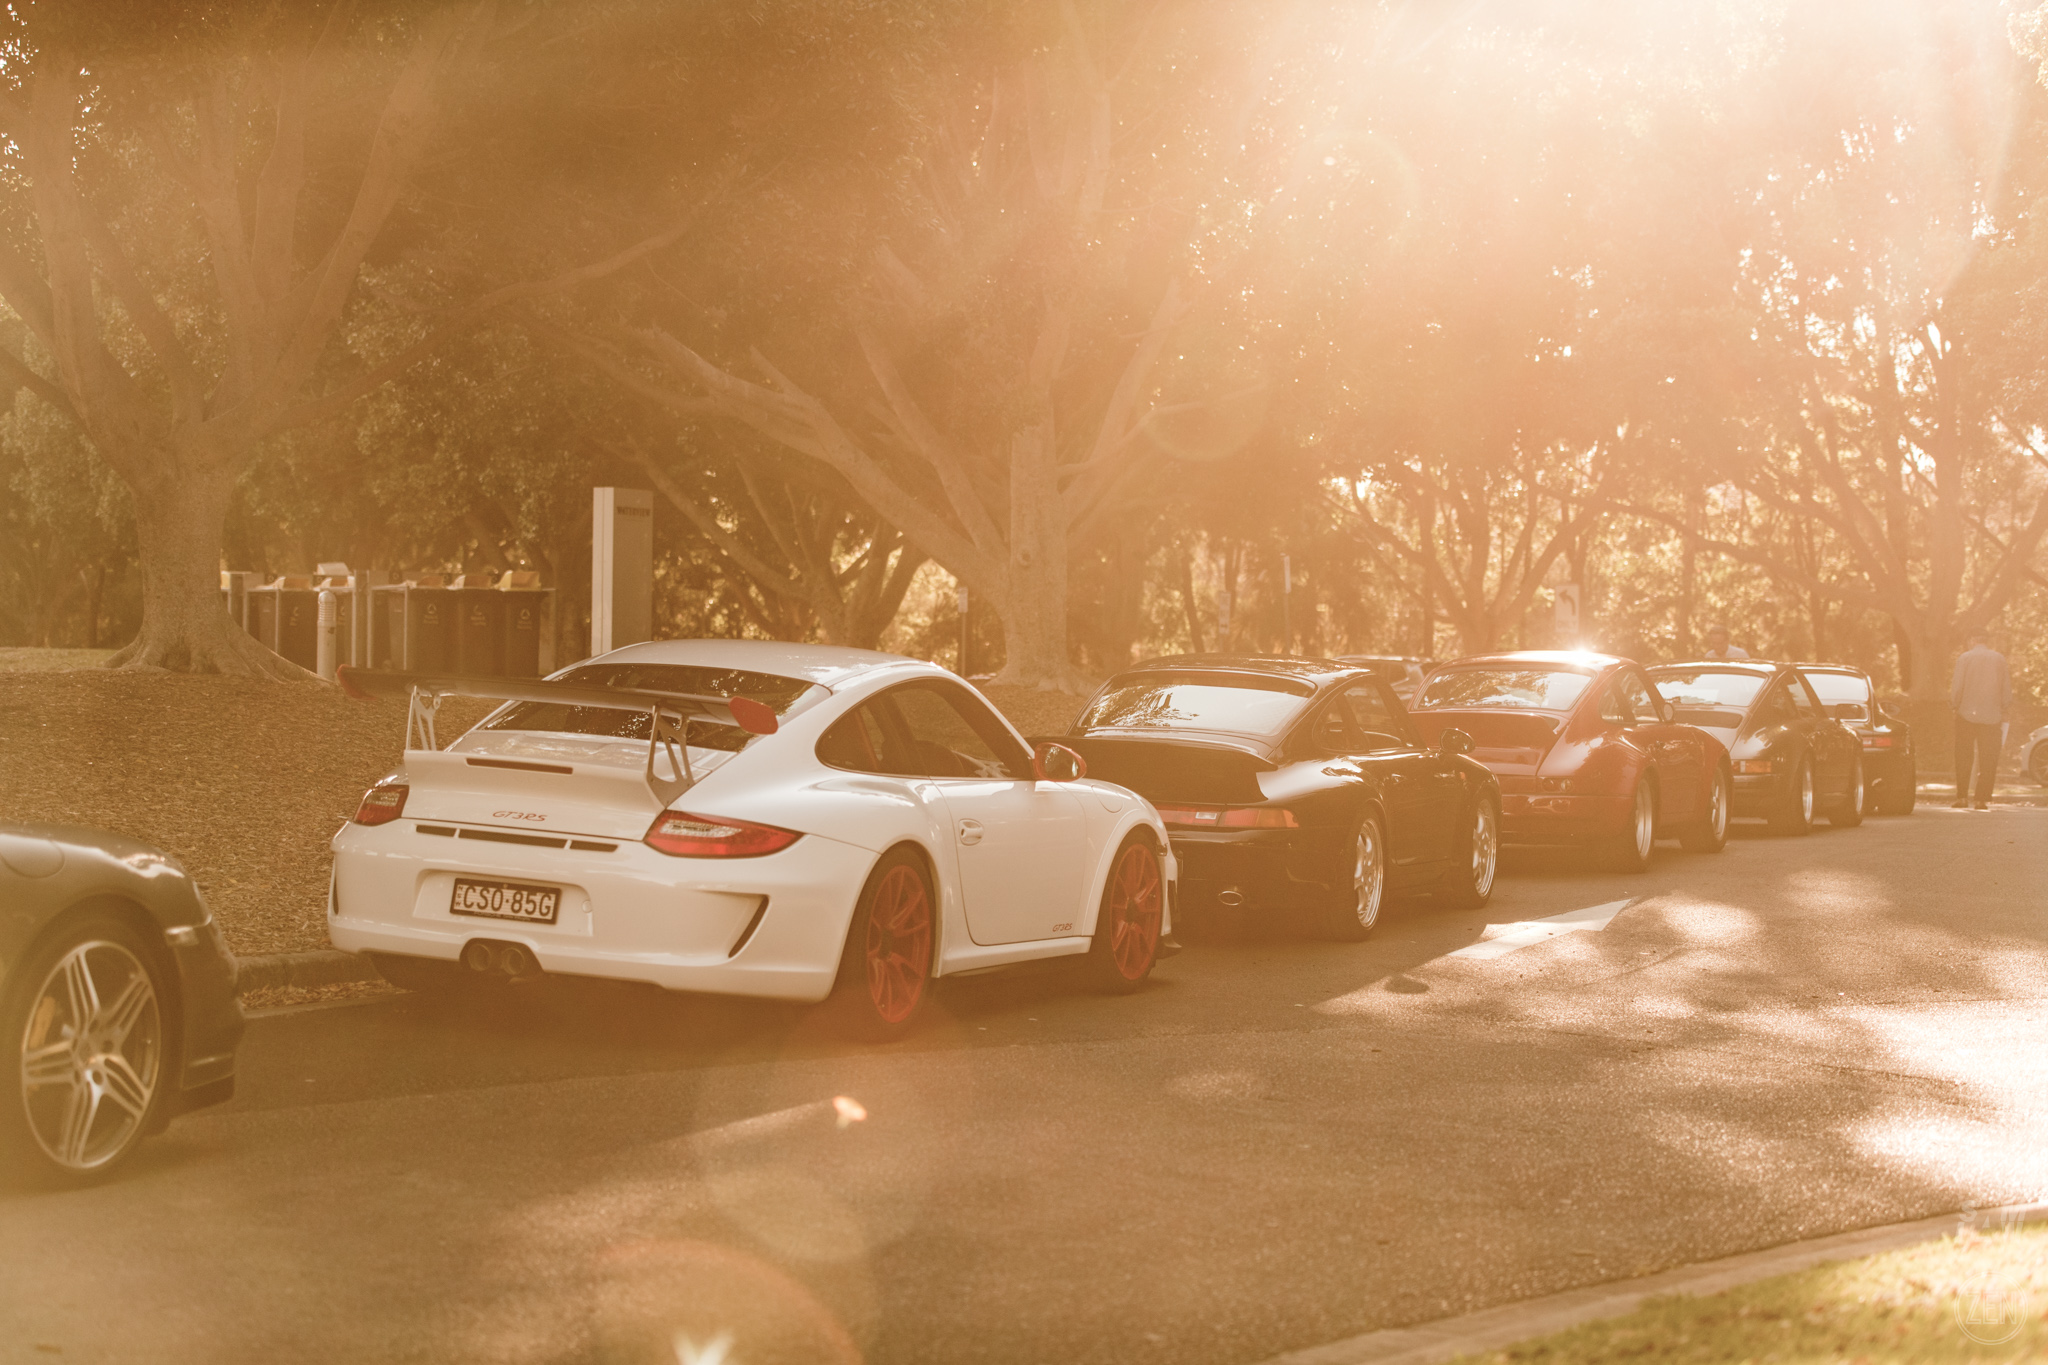 2019-10-27 - Autohaus Porsches & Coffee 069